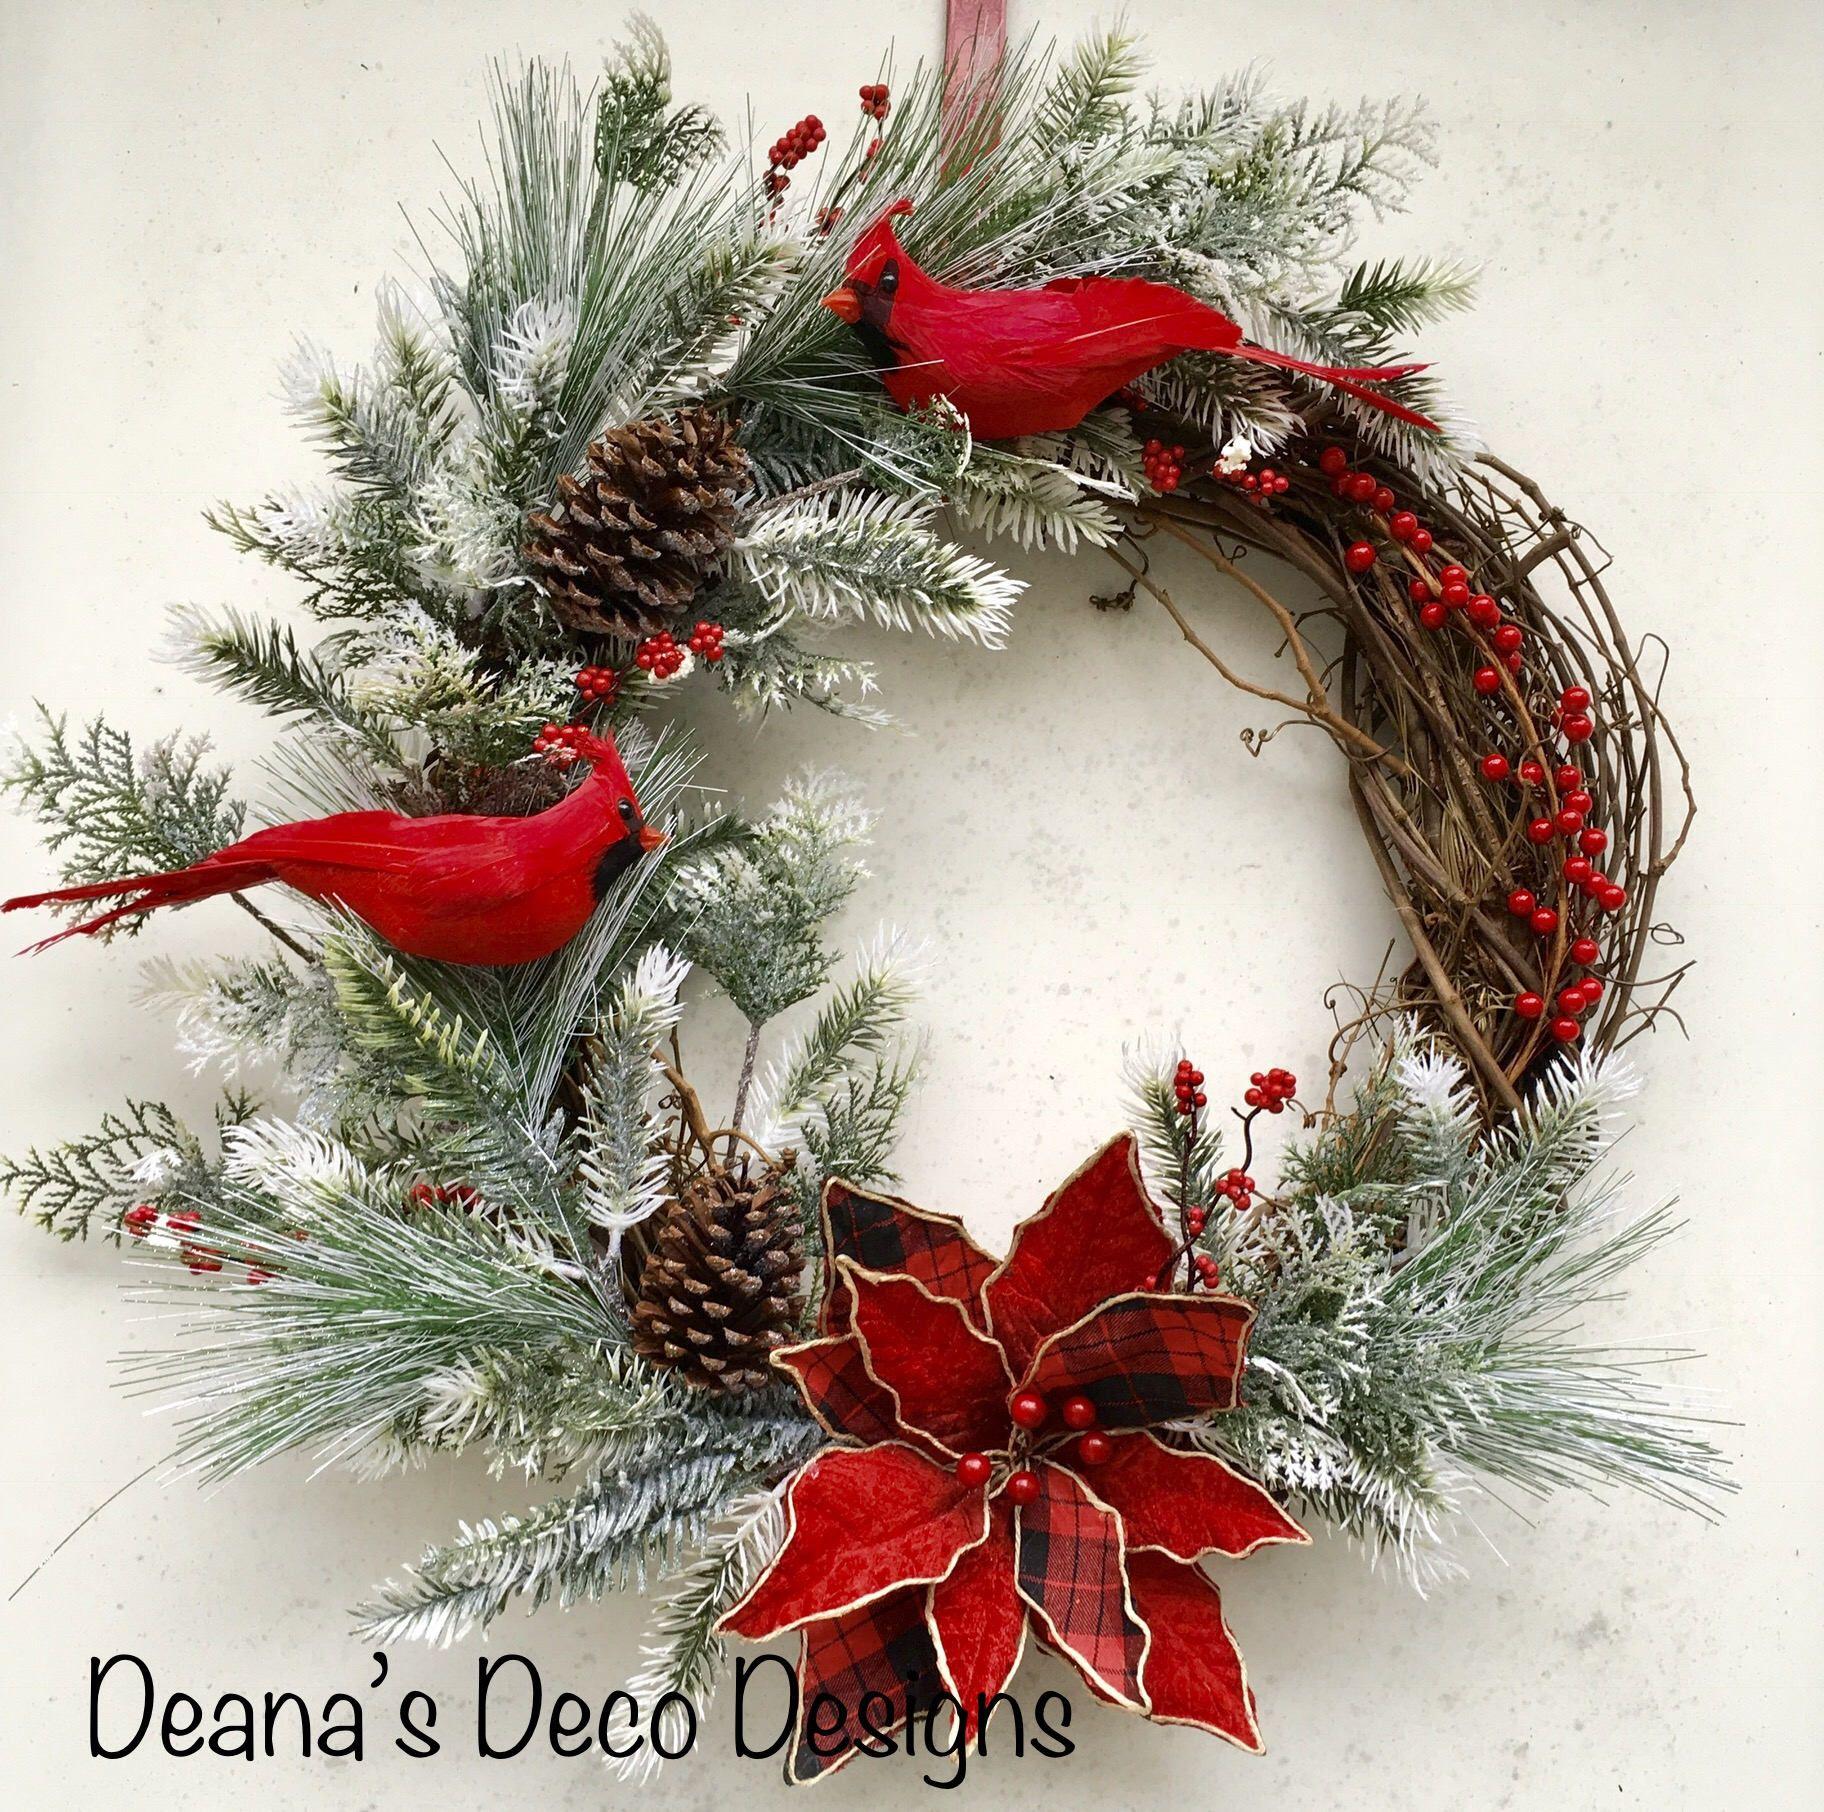 Christmas 18cm Mini Hanging Door Wreath with Red Berries and Pine Cones